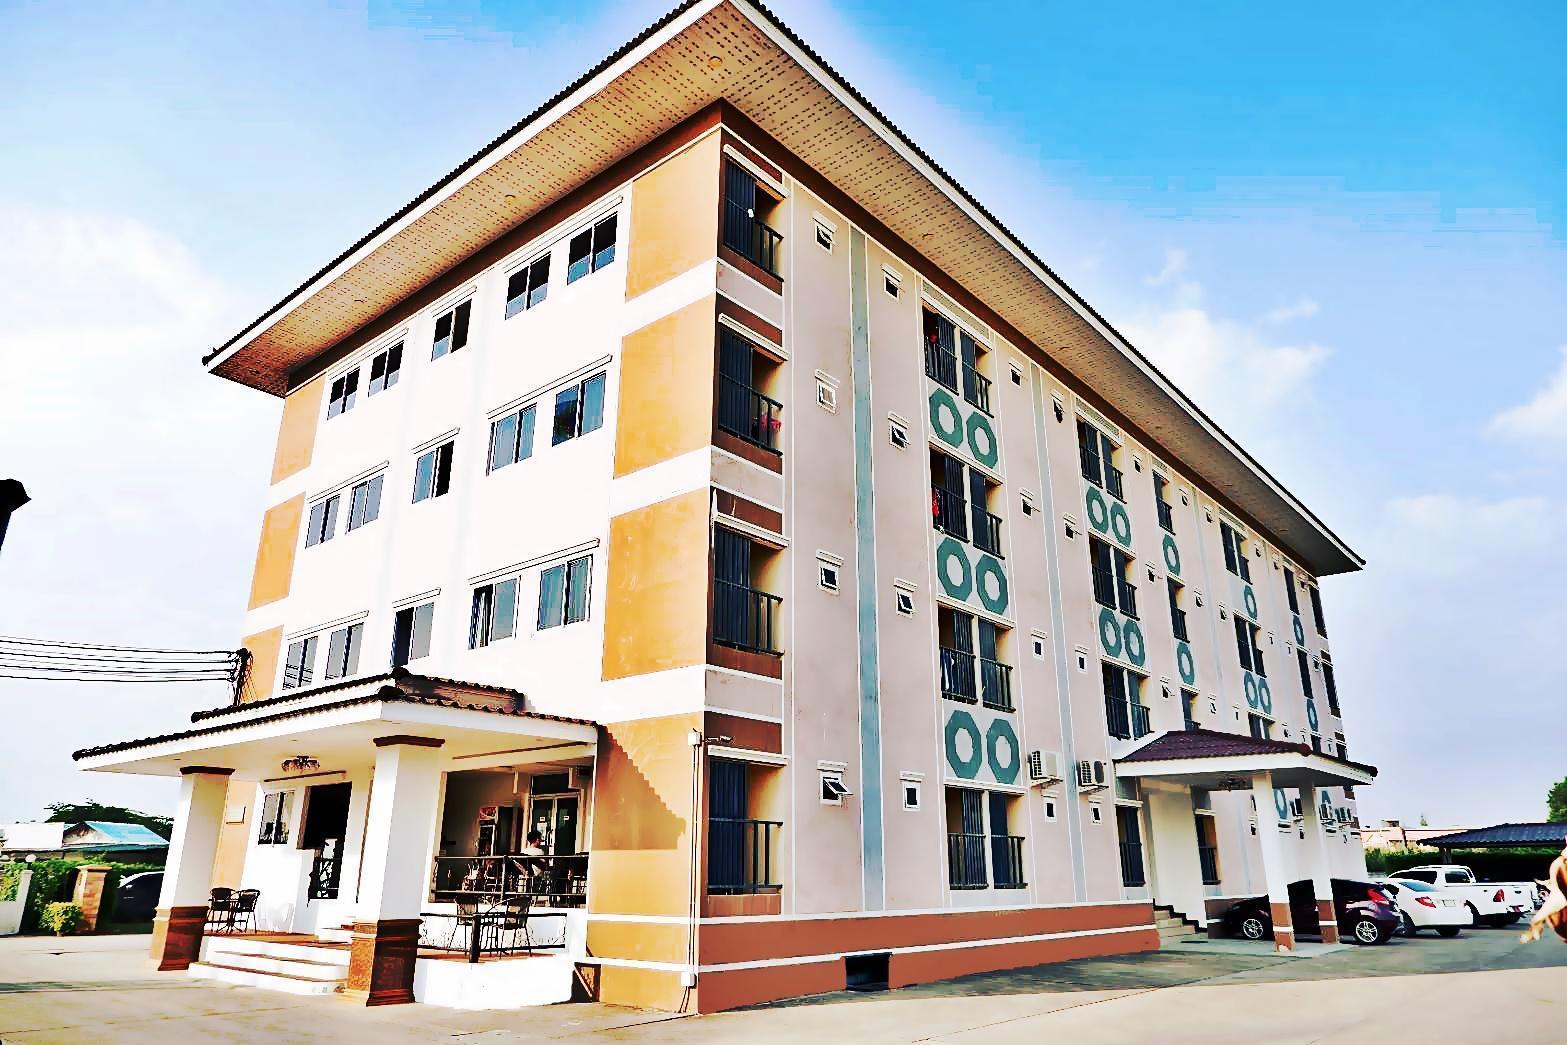 Baanmae Residence pluak daeng อพาร์ตเมนต์ 1 ห้องนอน 1 ห้องน้ำส่วนตัว ขนาด 50 ตร.ม. – ปลวกแดง